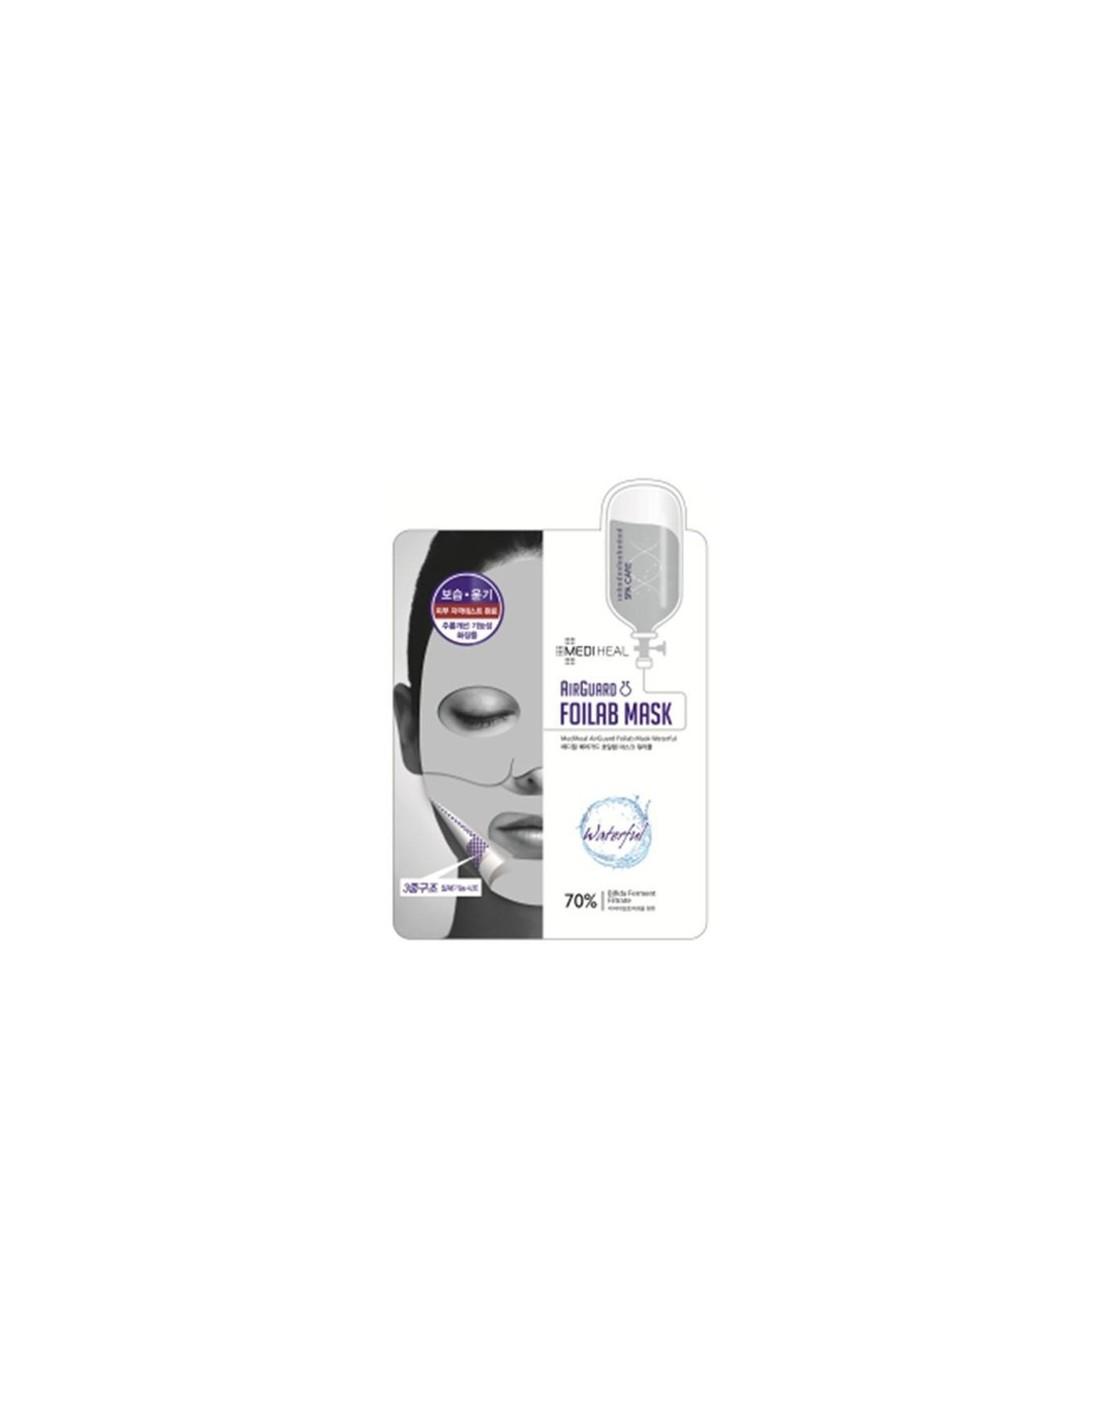 Medi Heal Airguard Foilab Mask Waterful 17ml Mediheal Collagen Impact Essential Pack